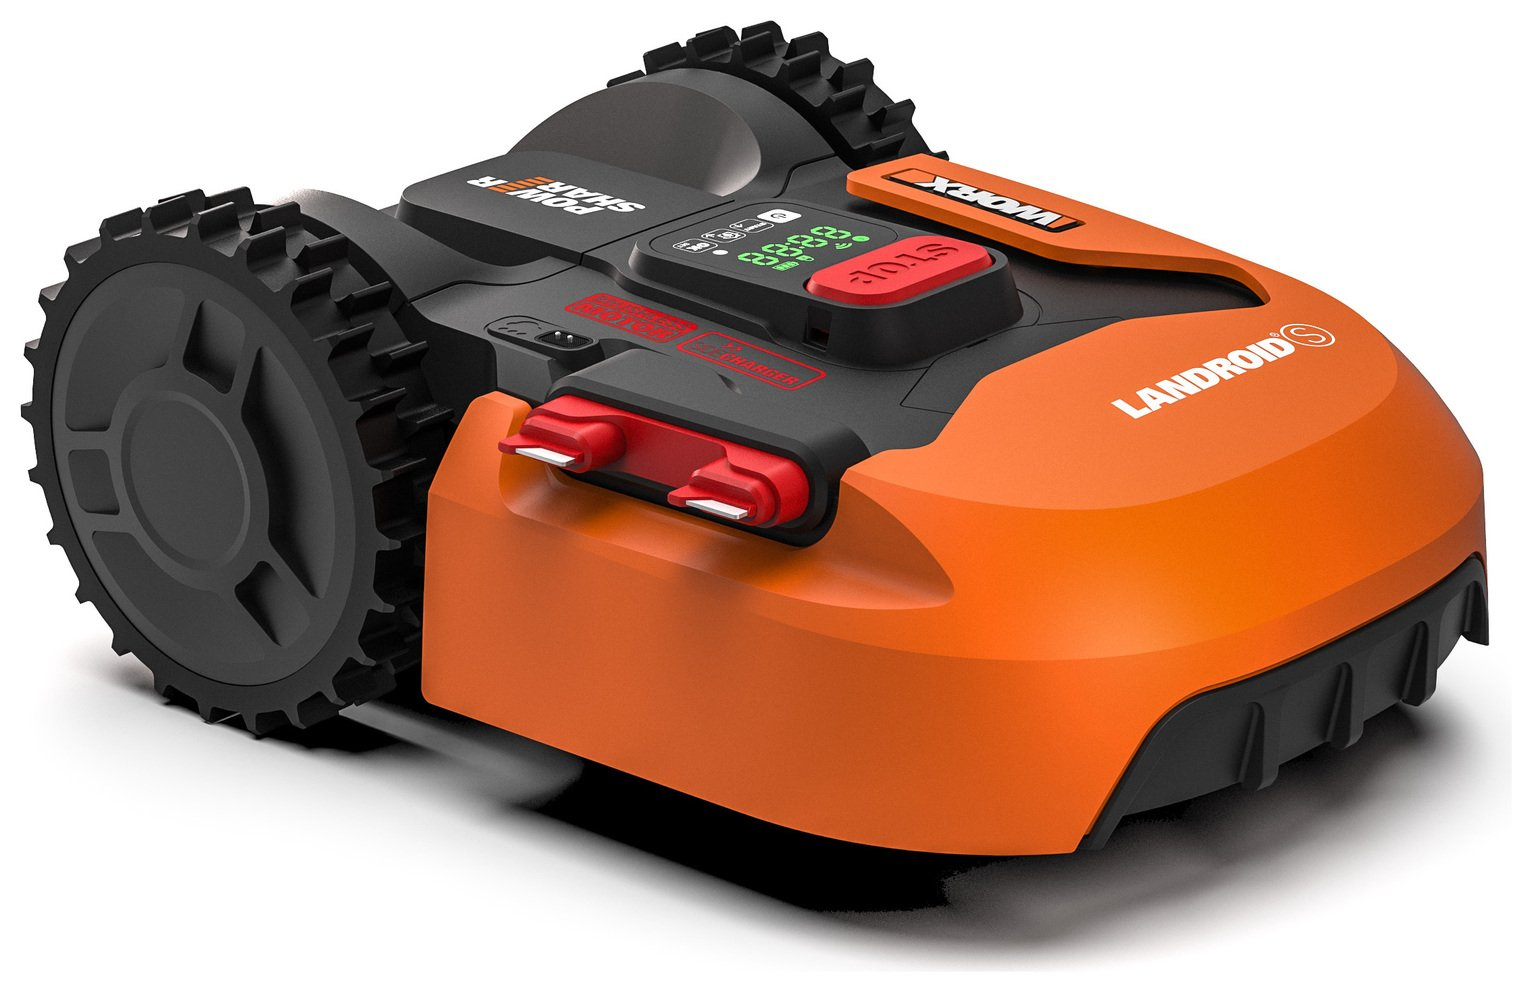 WORX WR130 300 M2 Landroid Robotic Lawnmower